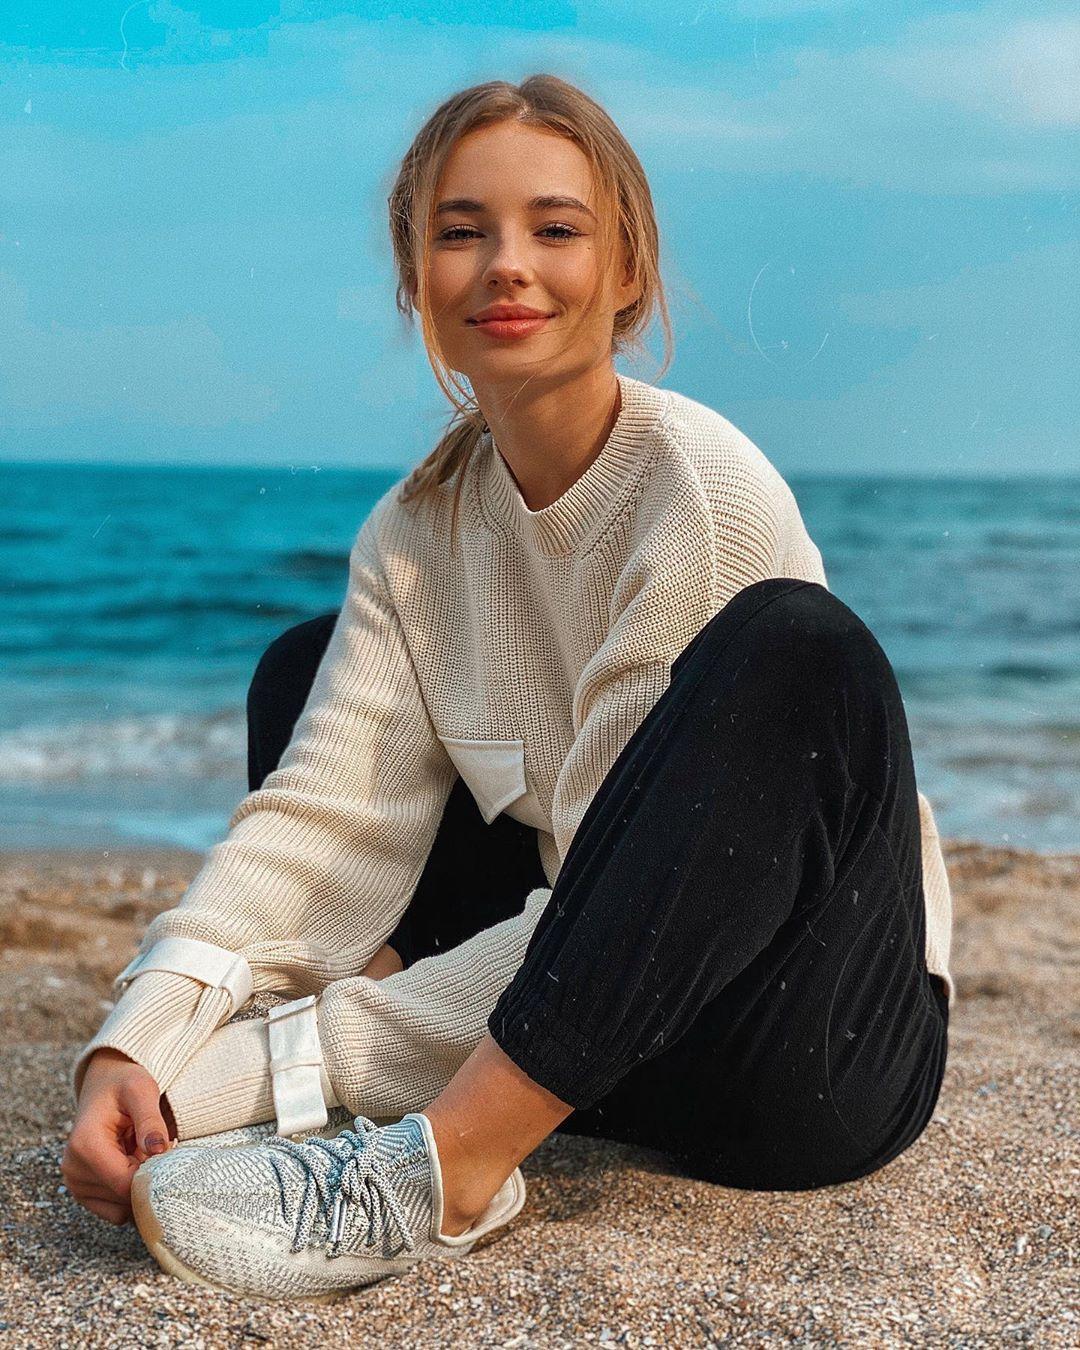 elizabethvasilenko/Instagram